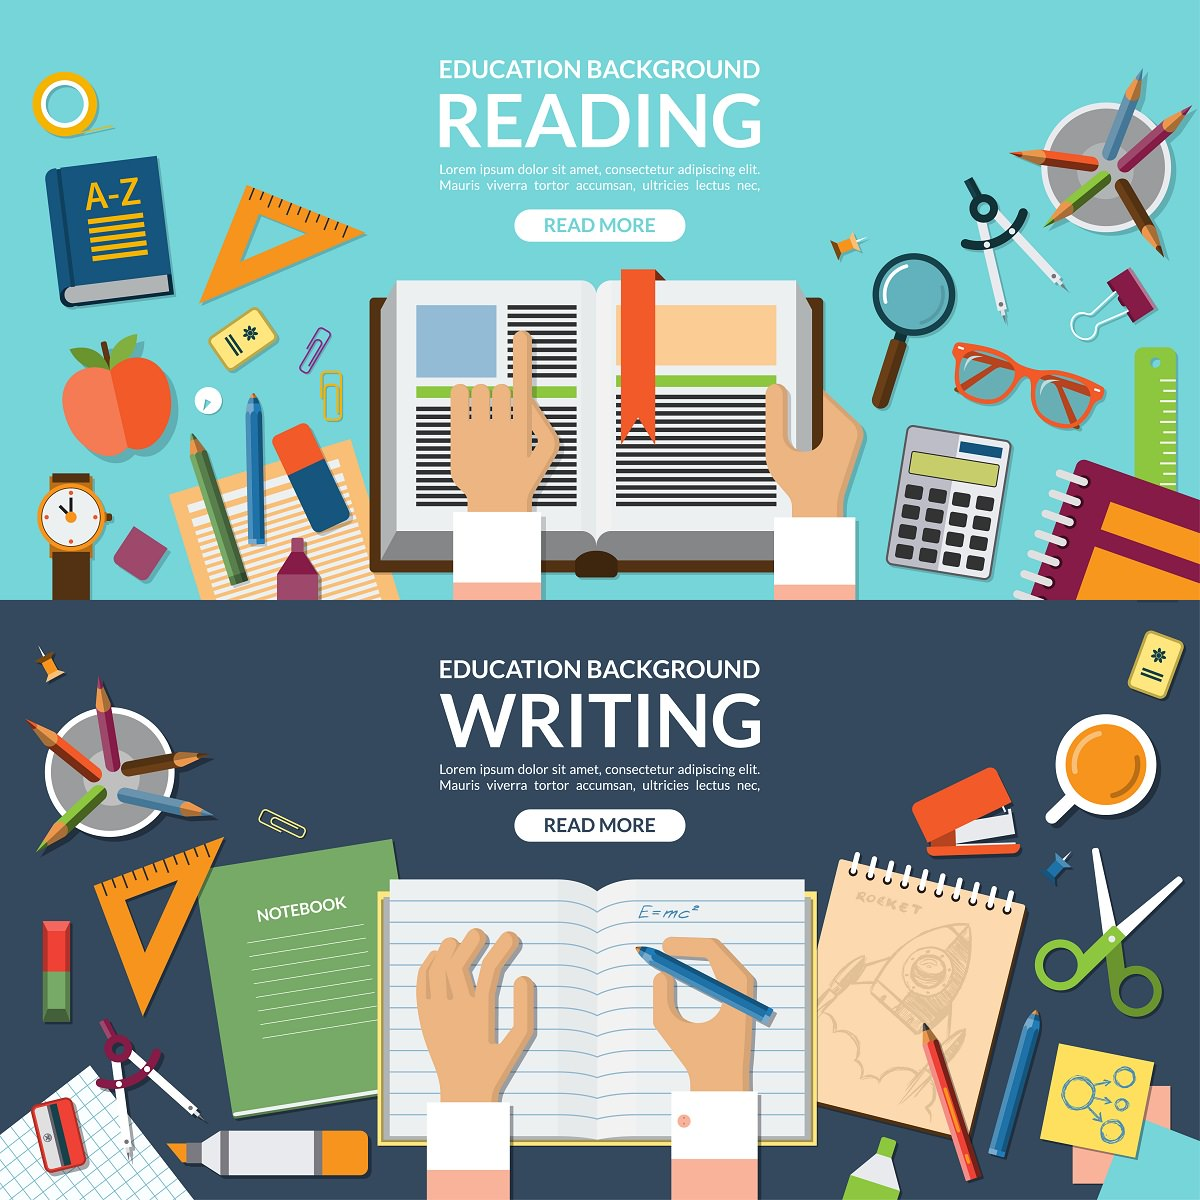 Grade 8 Reading & Writing  Rock On Coding, Ap Computer Science, Physics, Sat Math & English